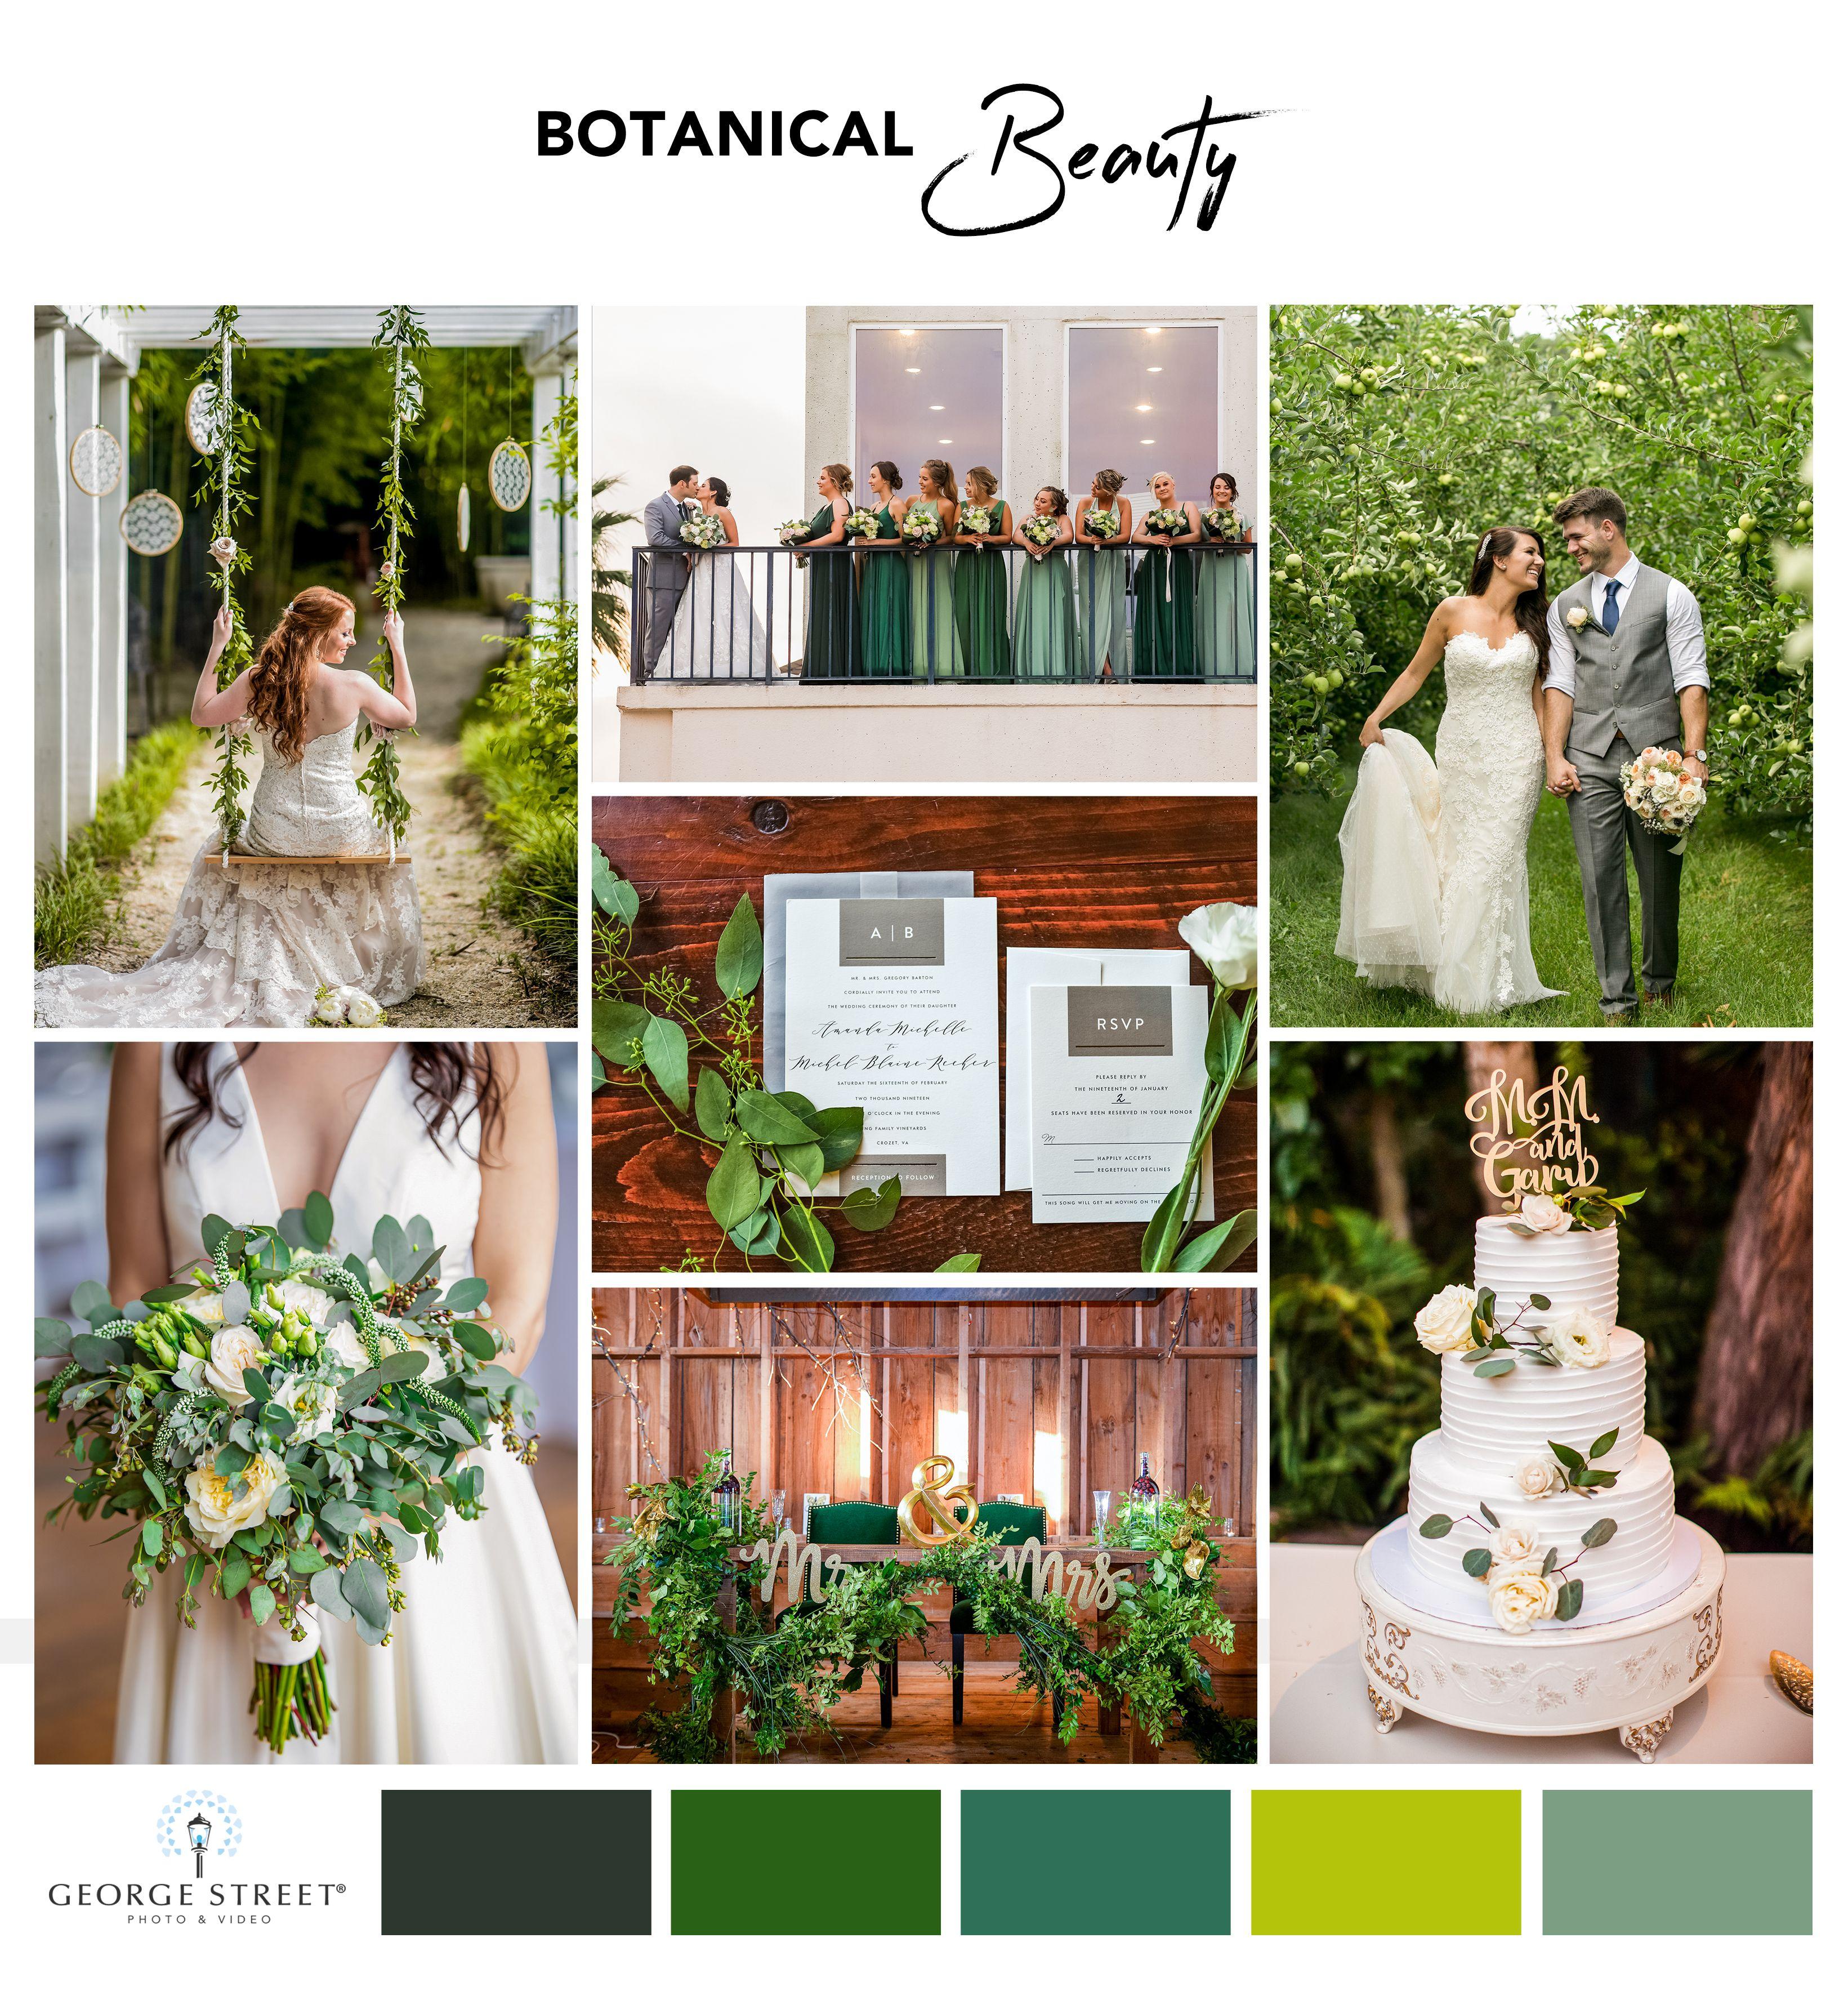 Blog George Street Photo Video Wedding Mood Board Wedding Photography And Videography Wedding Inspiration Board